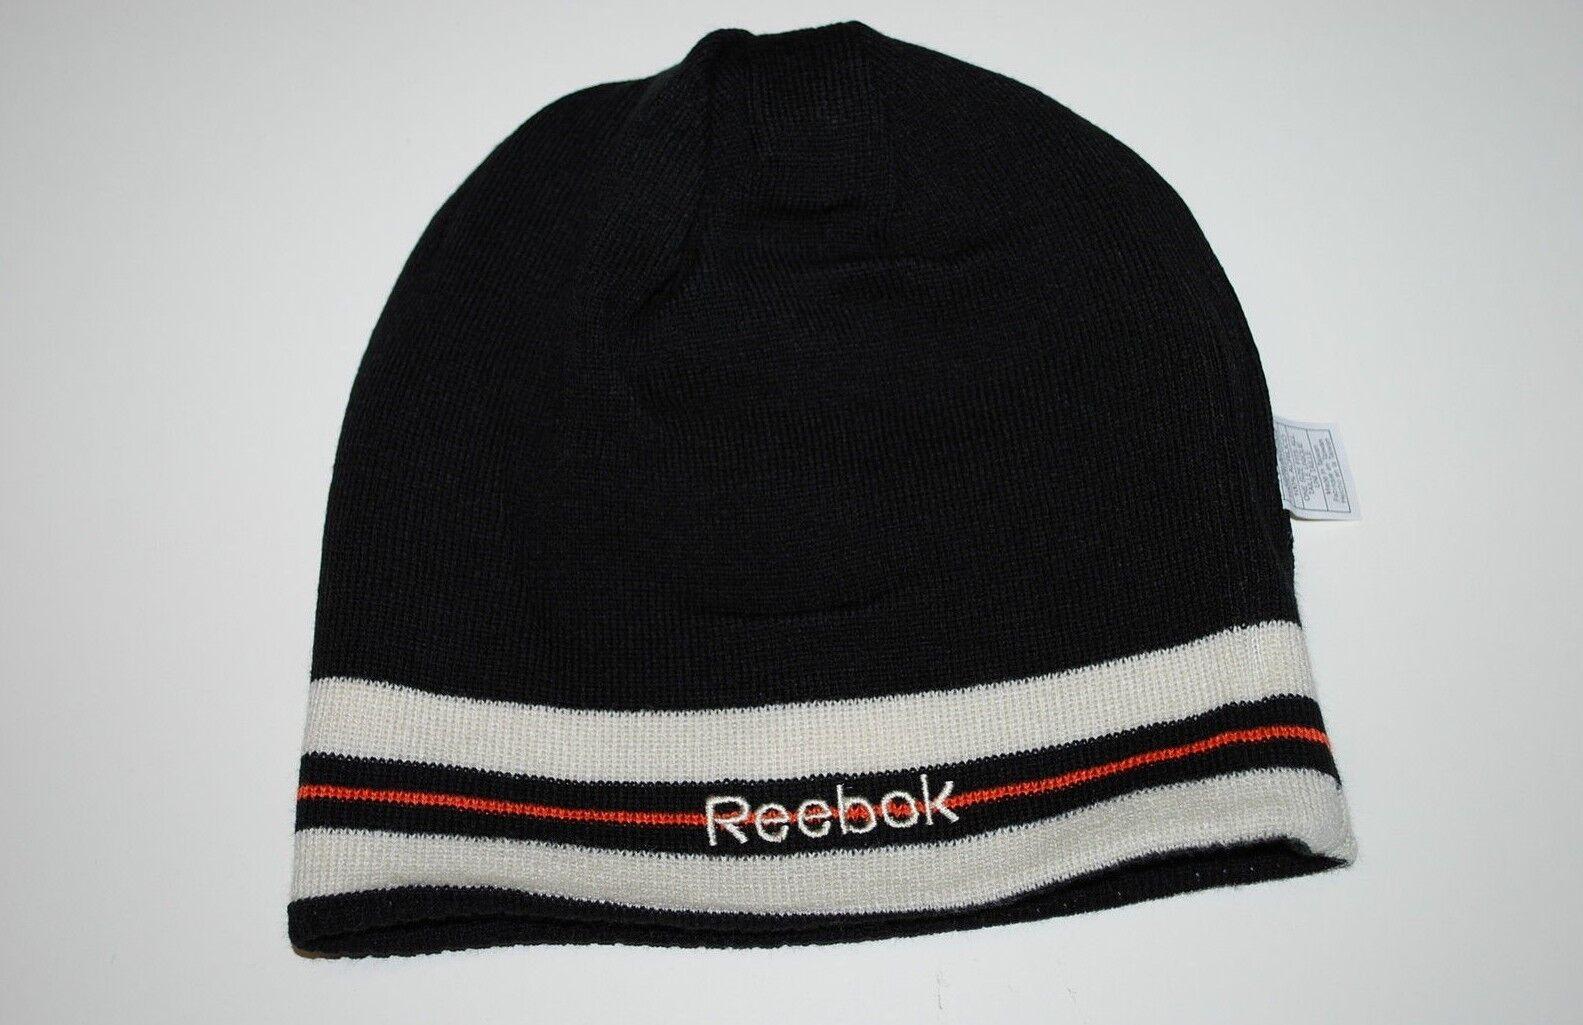 Philadelphia Knit Flyers Reebok NHL Winter Classic Reversible Knit Philadelphia Hockey Beanie 9f6d5a